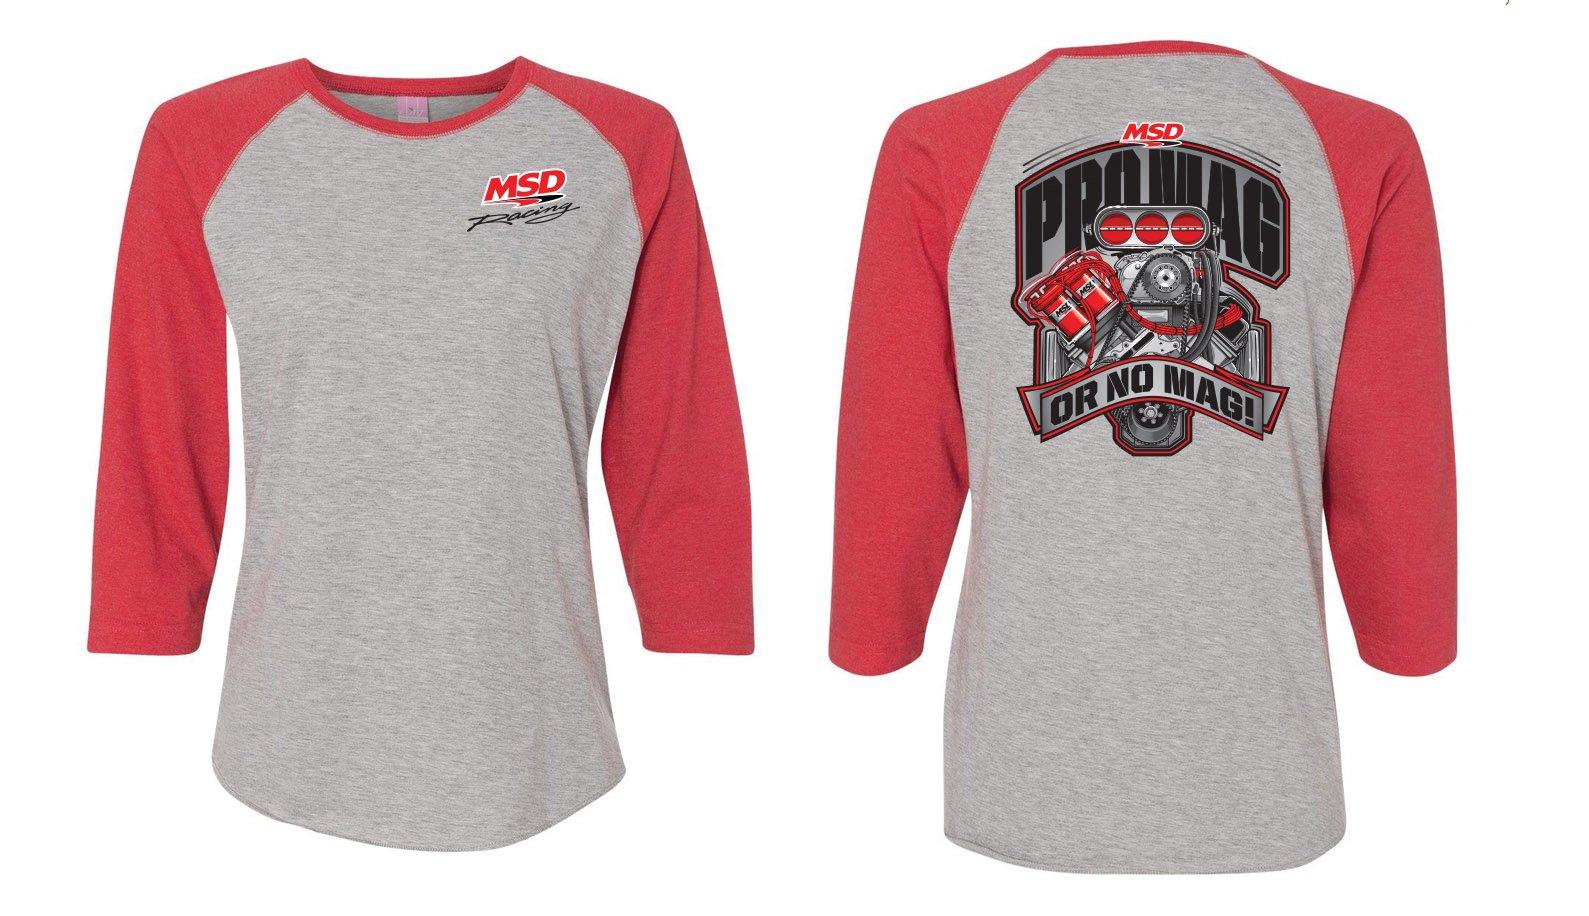 95247 - MSD Racing, Jersey Baseball T-Shirt, XX-Large Image